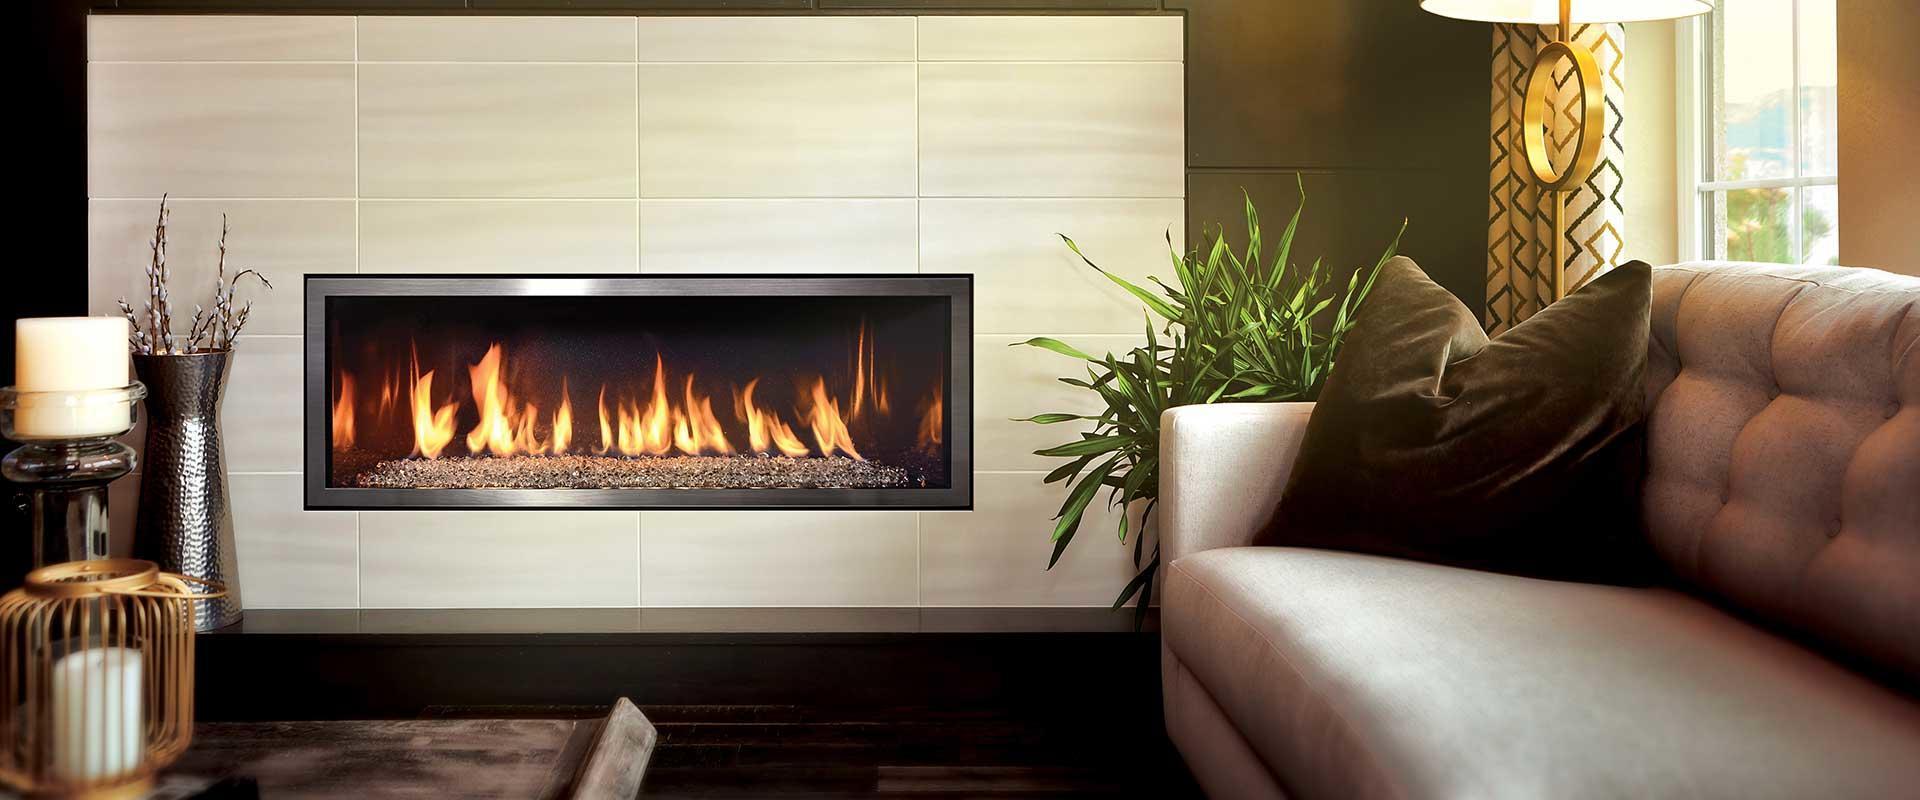 Sensational Waterford Mi Overhead Door And Fireplace Find Overhead Download Free Architecture Designs Grimeyleaguecom